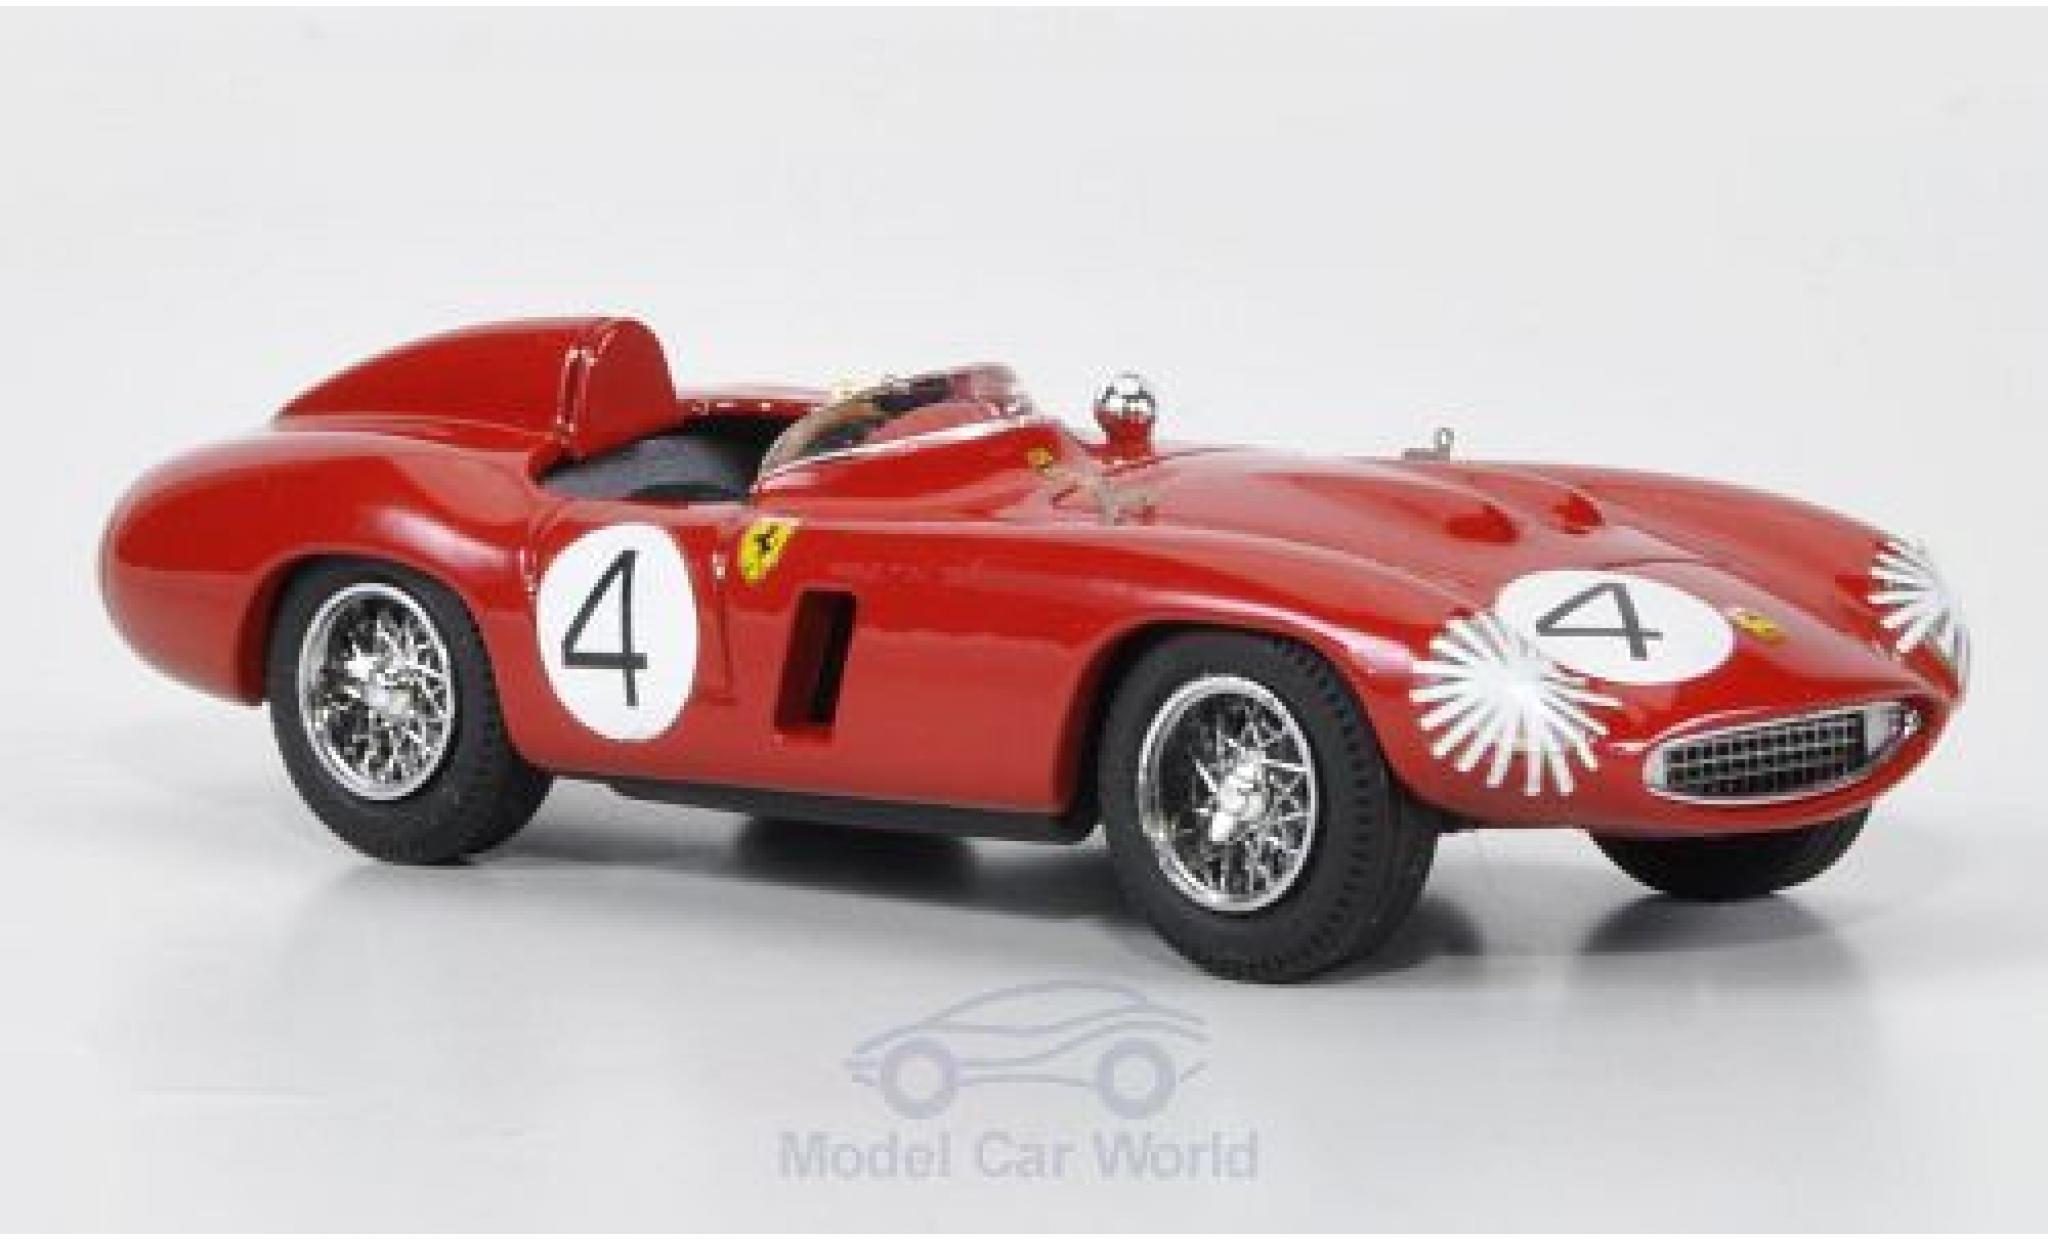 Ferrari 750 1955 1/43 Best Monza No.4 Tourist Trophy